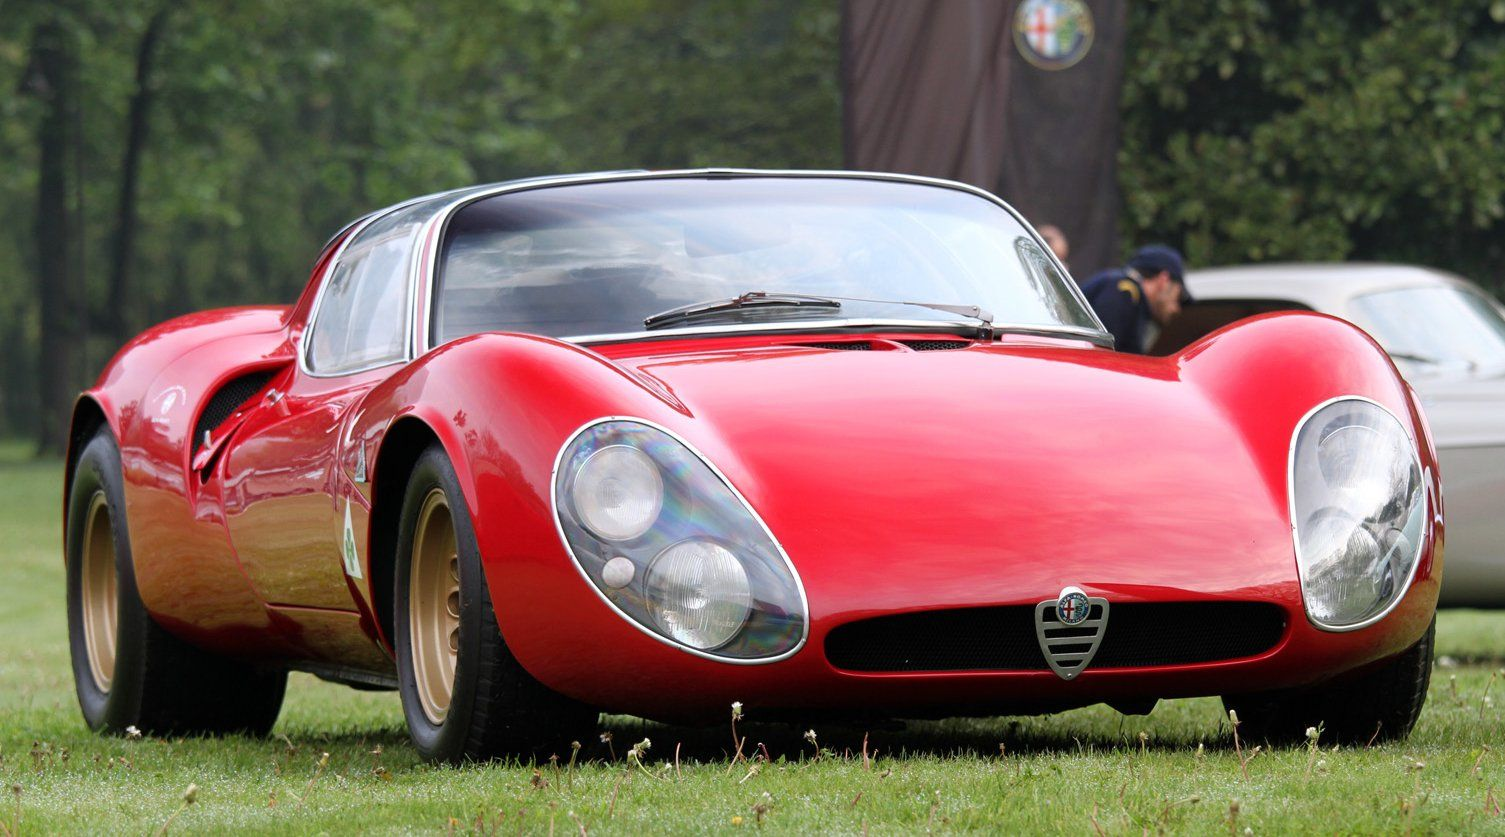 ❦ 1968 Alfa Romeo 33 Stradale